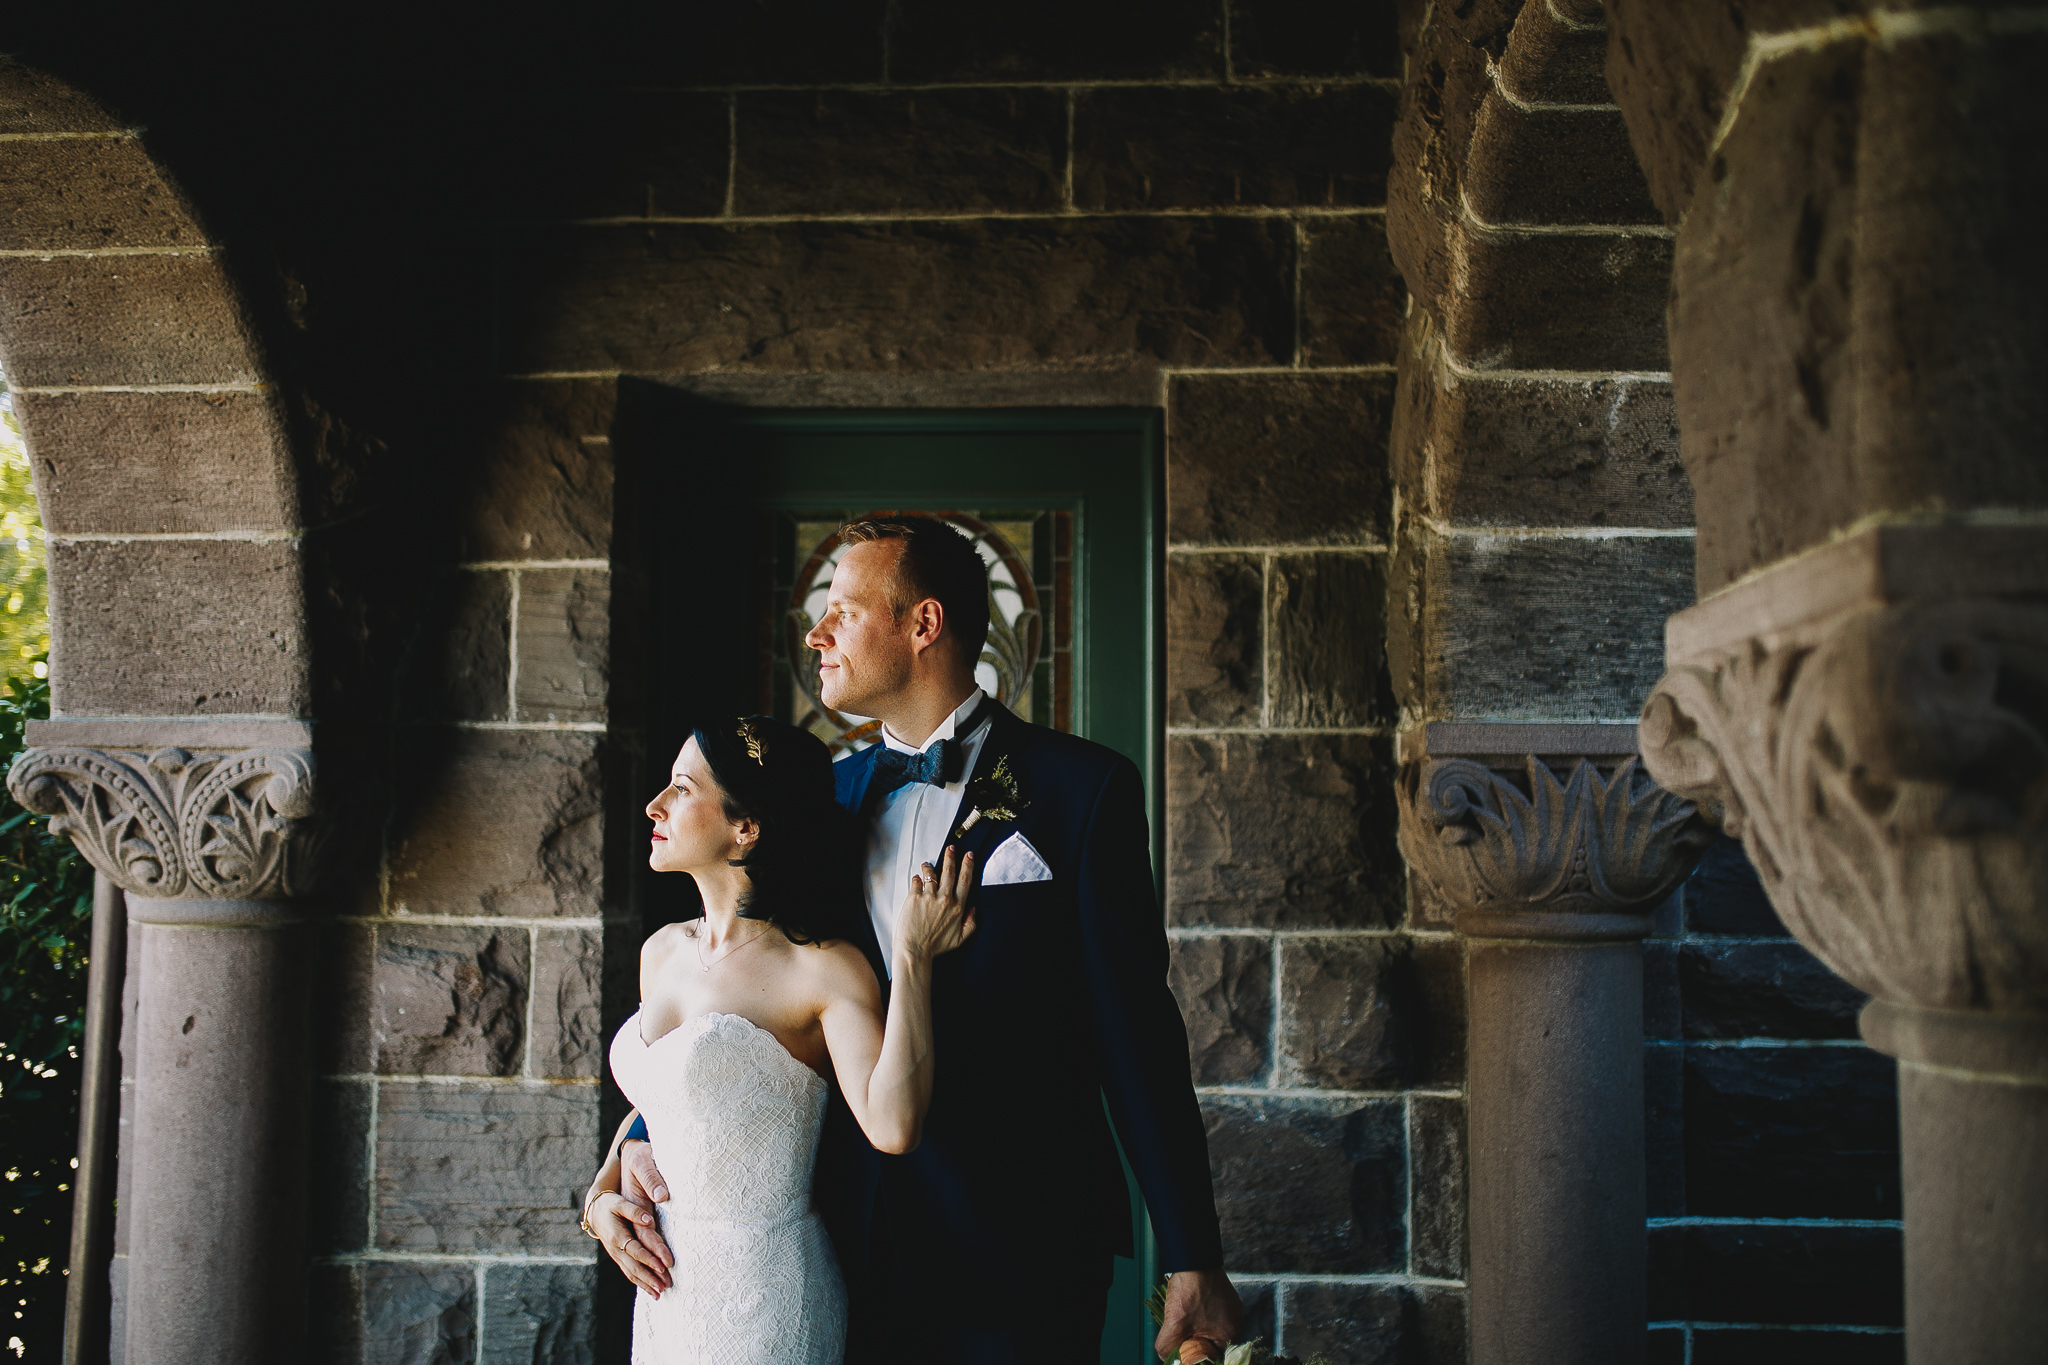 Archer Inspired Photography Marin Headlands Wedding and Lifestyle Photographer Elegant Castle-13.jpg